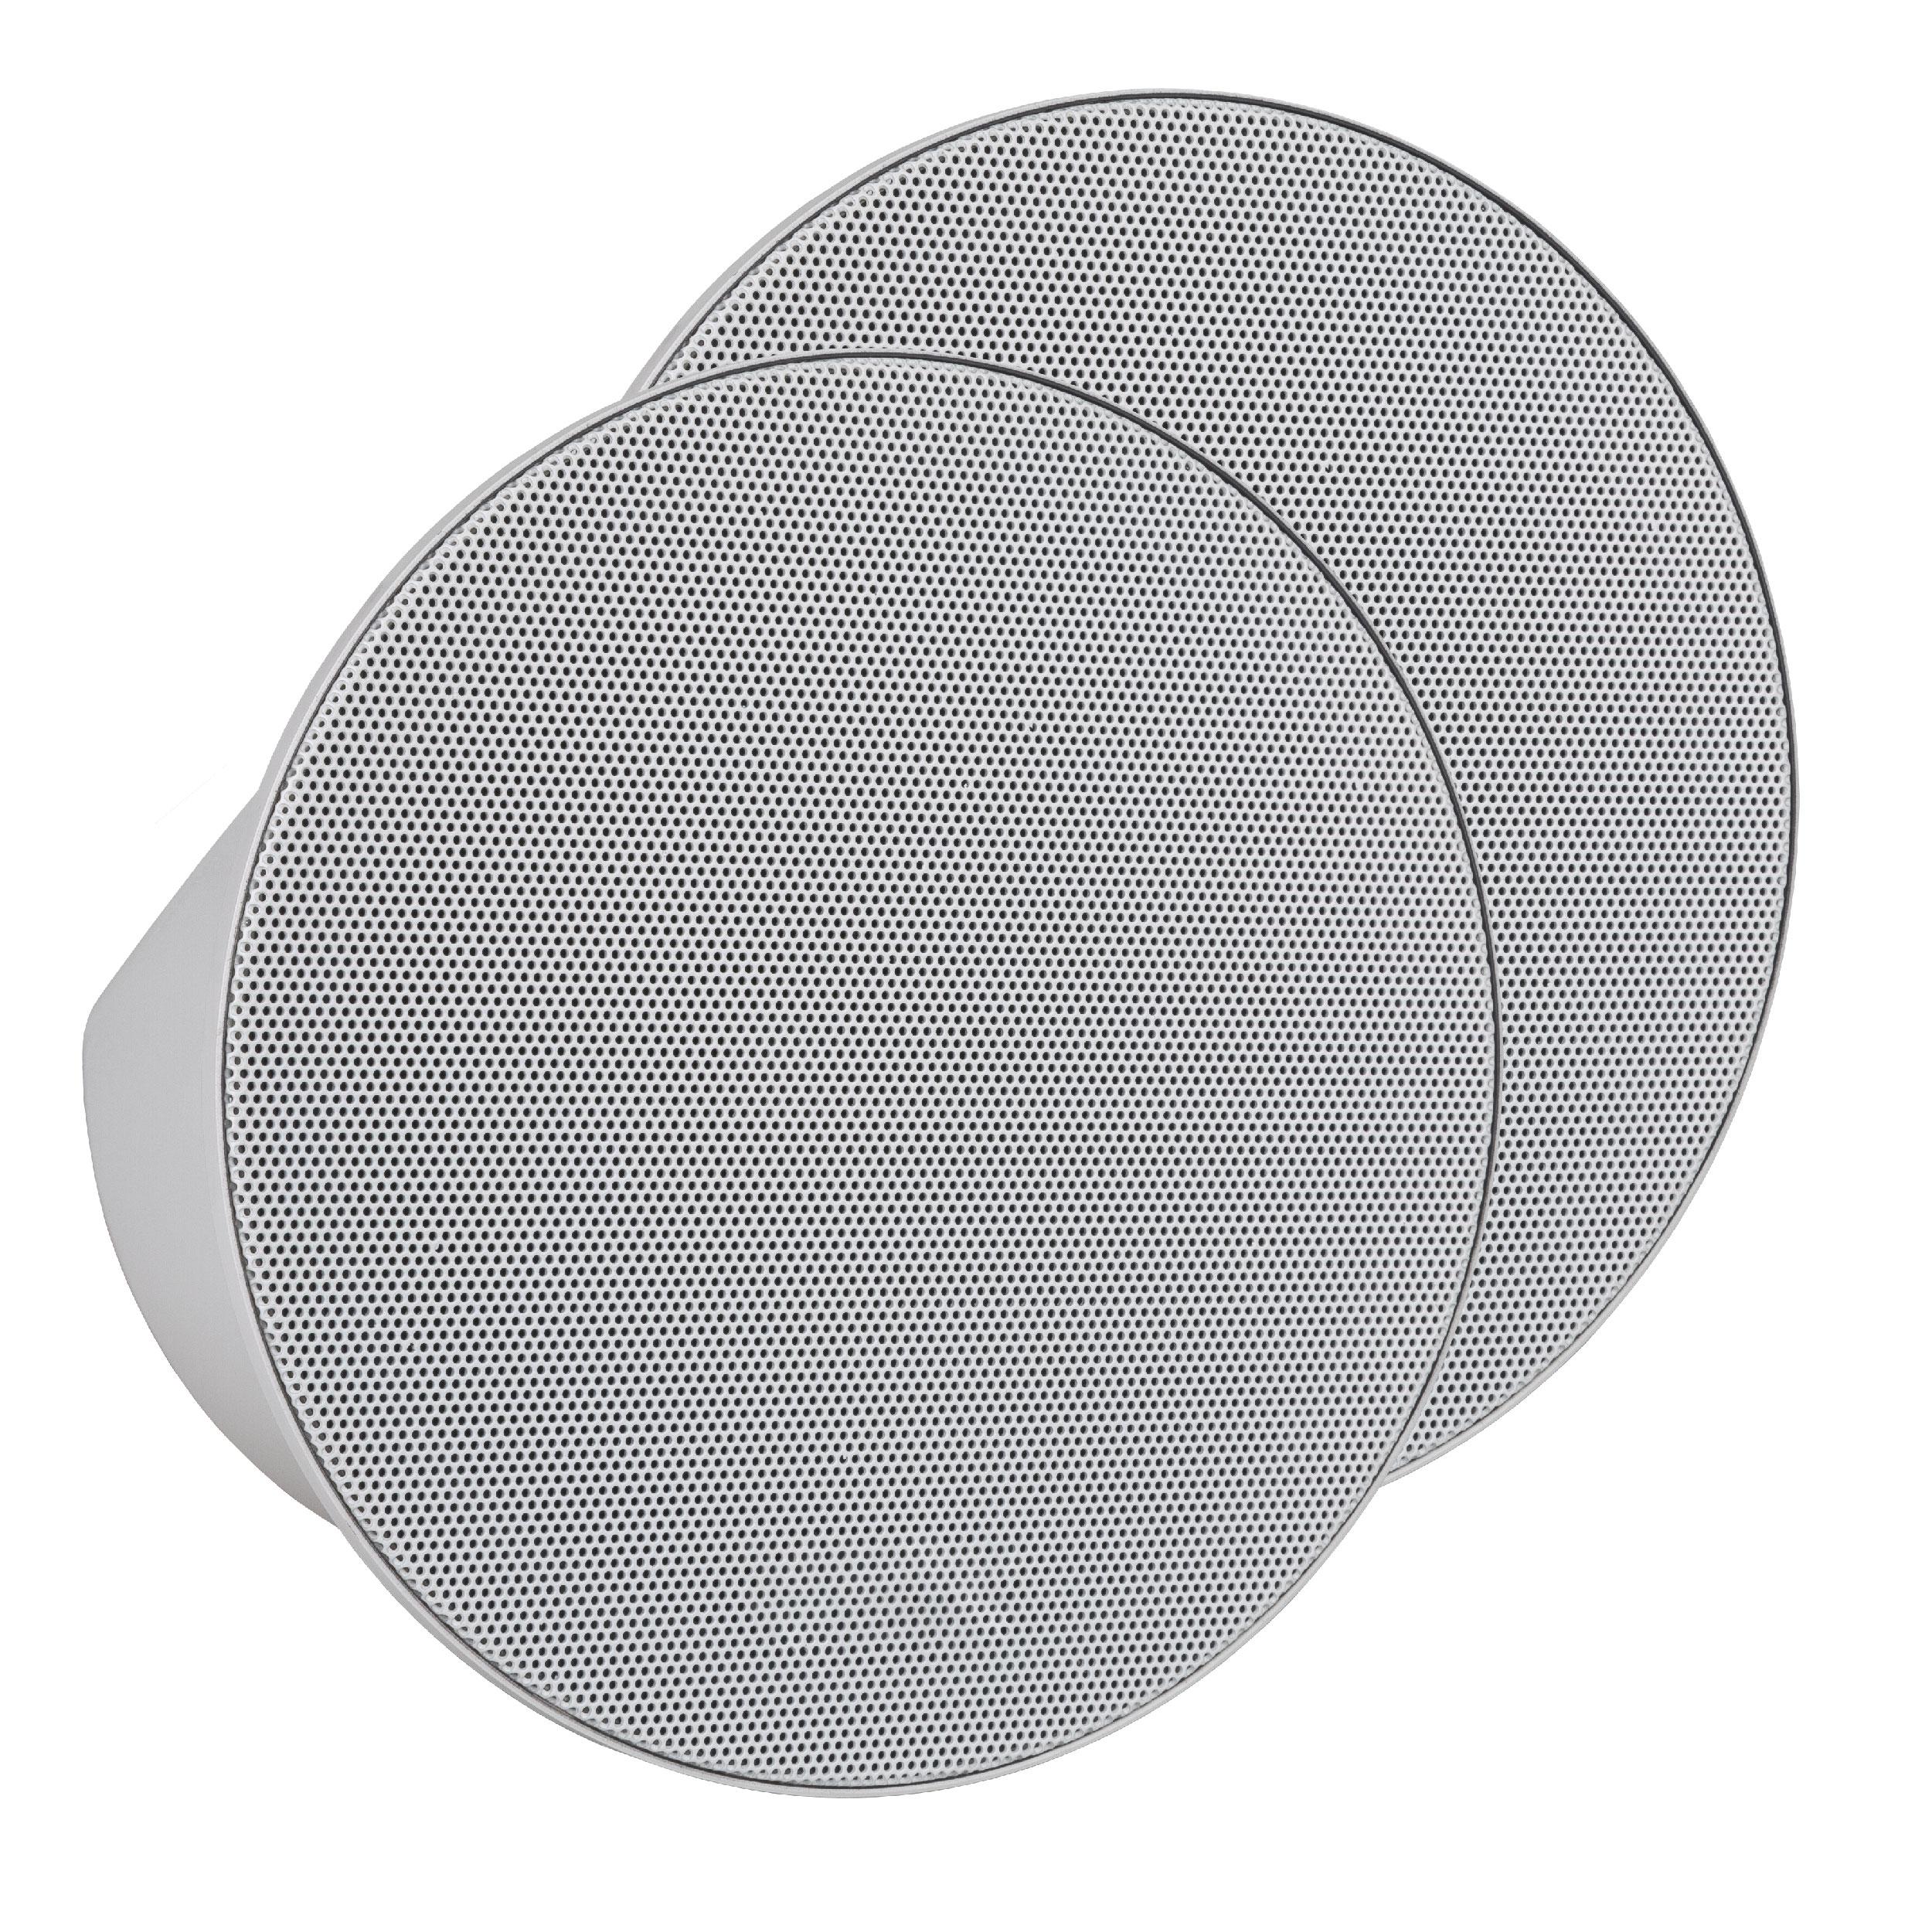 2x 6.5ÔǦ active ceiling speakers 2x 10W Bluetooth 4.0